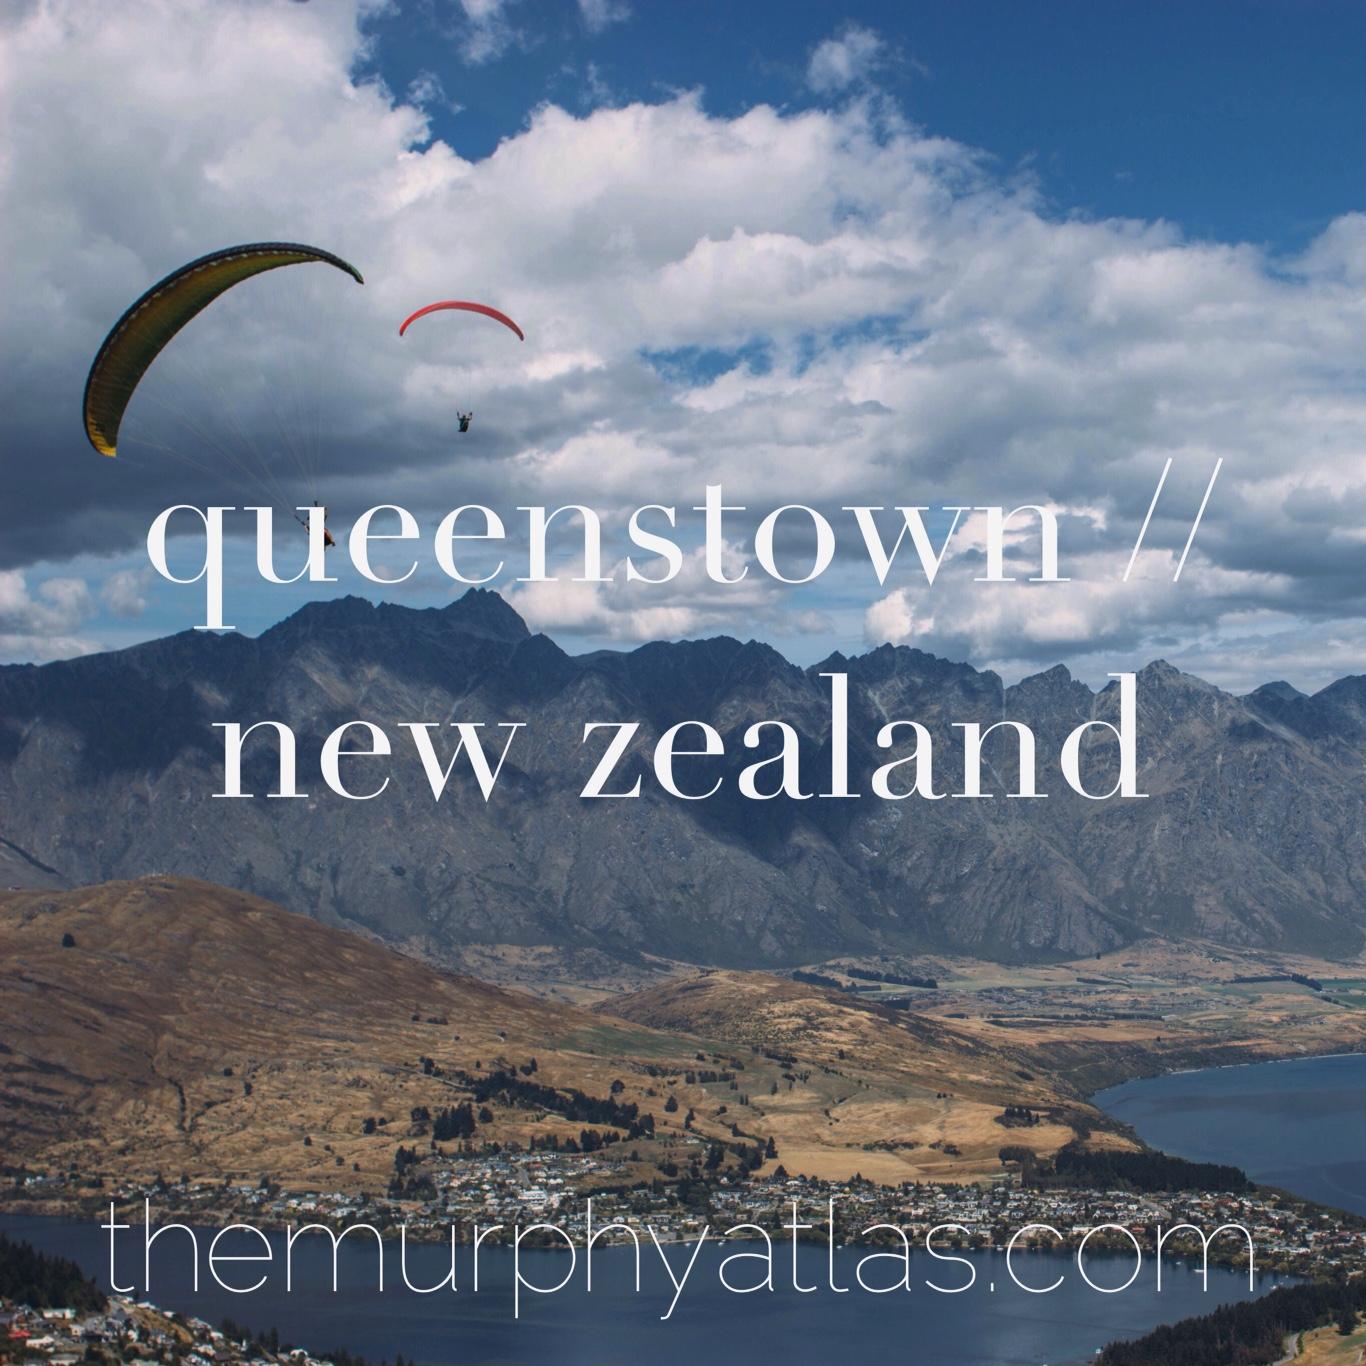 Queenstown New Zealand City Guide - The Murphy Atlas